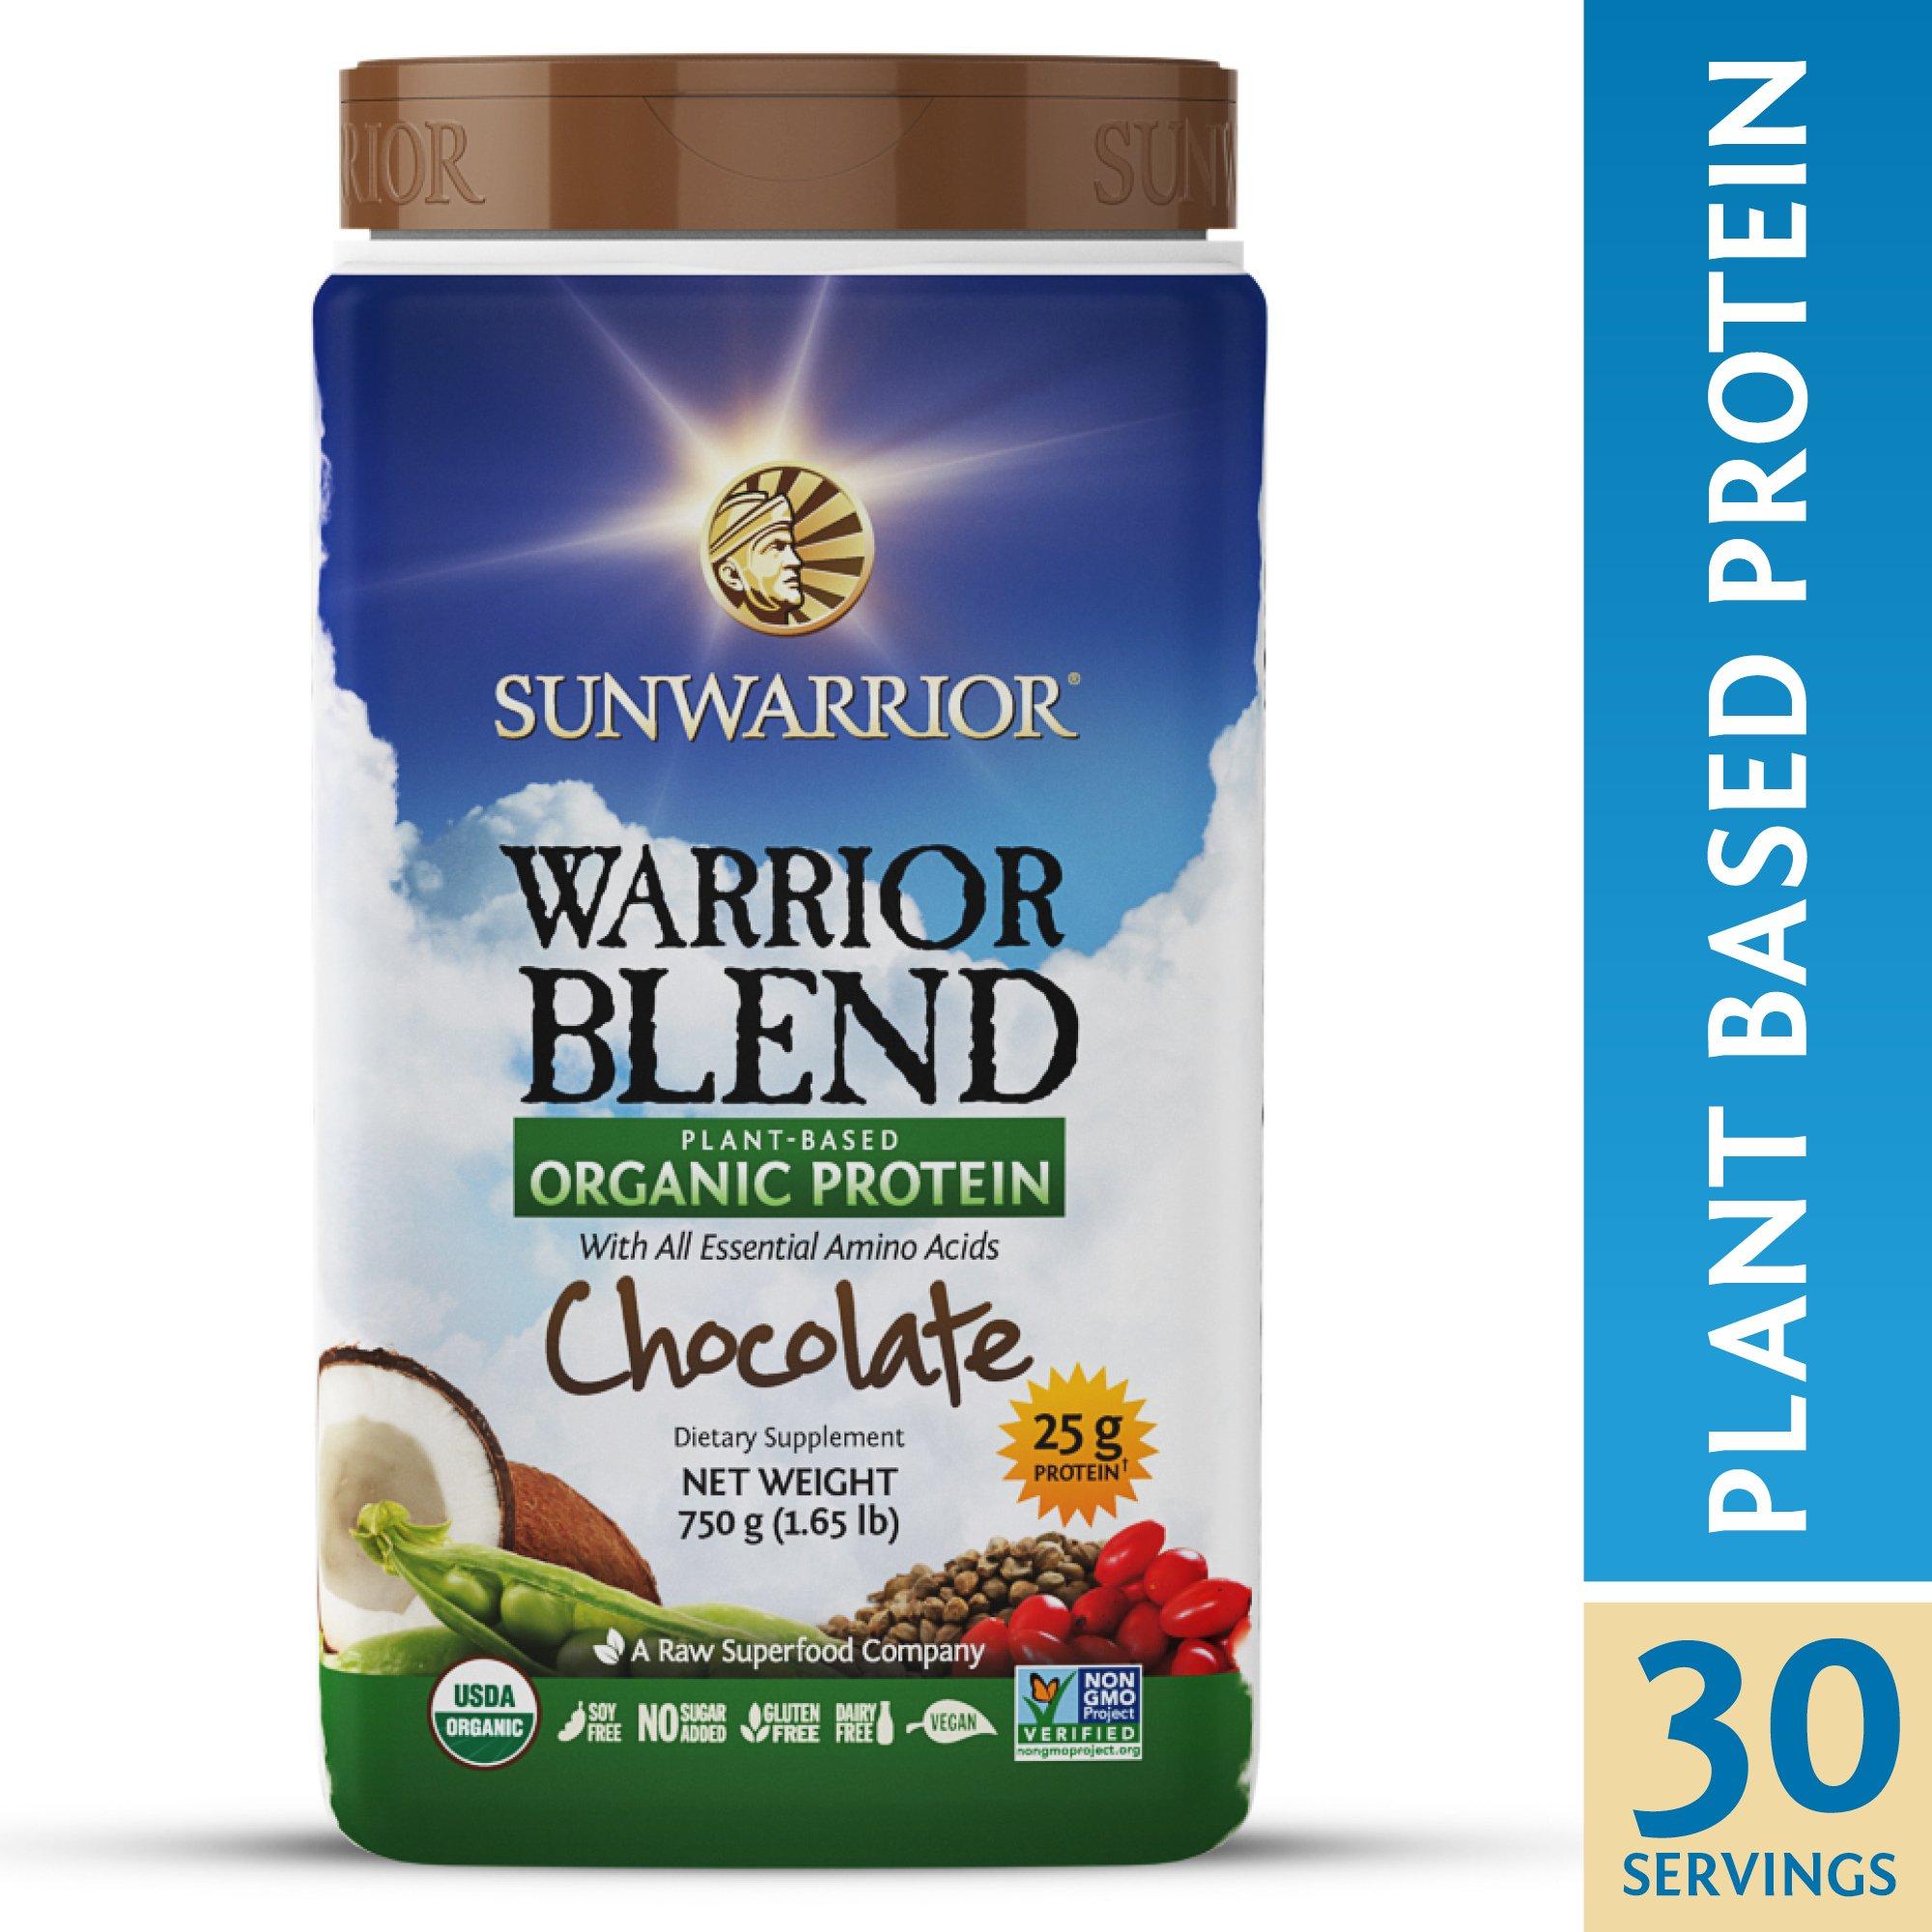 Sunwarrior Warrior Blend Protein Organic Plant-Based Chocolate 1 65 lb 750 g